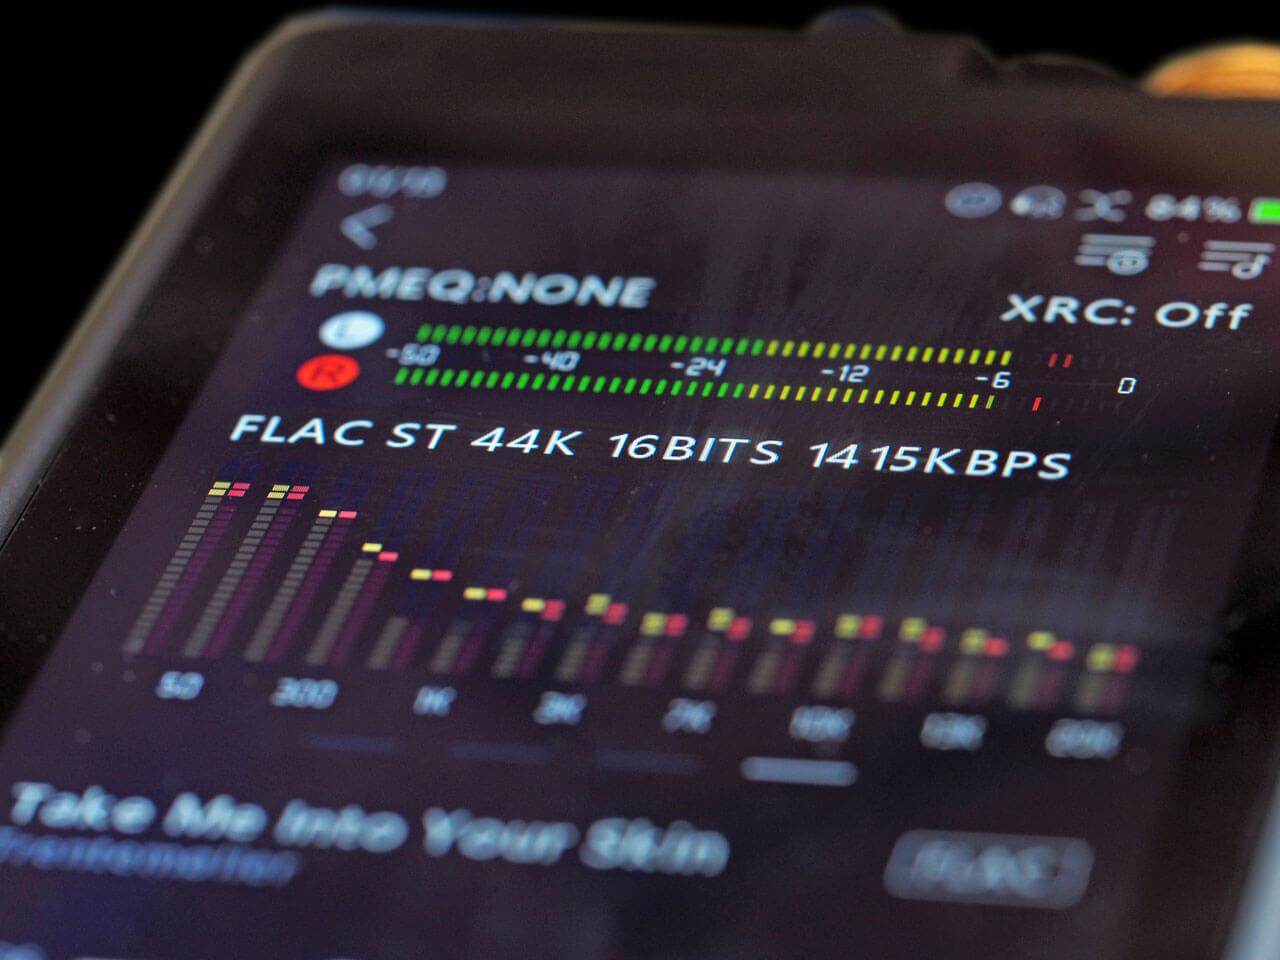 Lotoo PAW Gold Touch: Frequenzpegelanzeige und Equalizer-Funktion